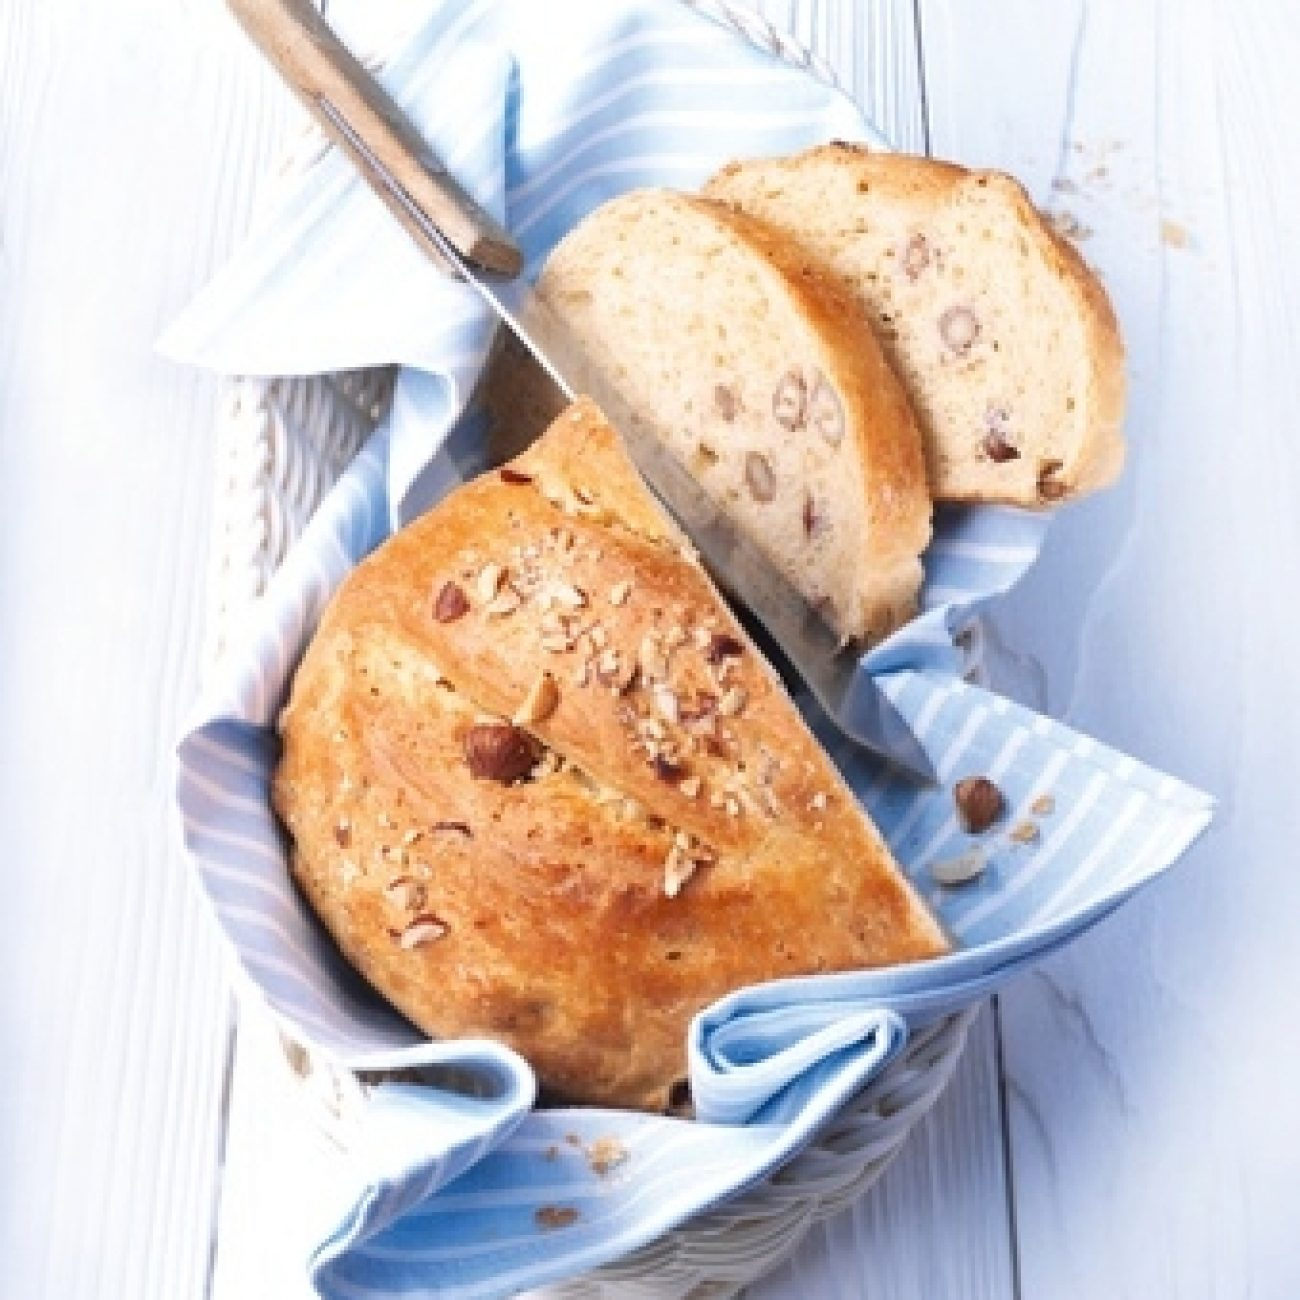 Magvas kenyér – Miele Főzőiskola